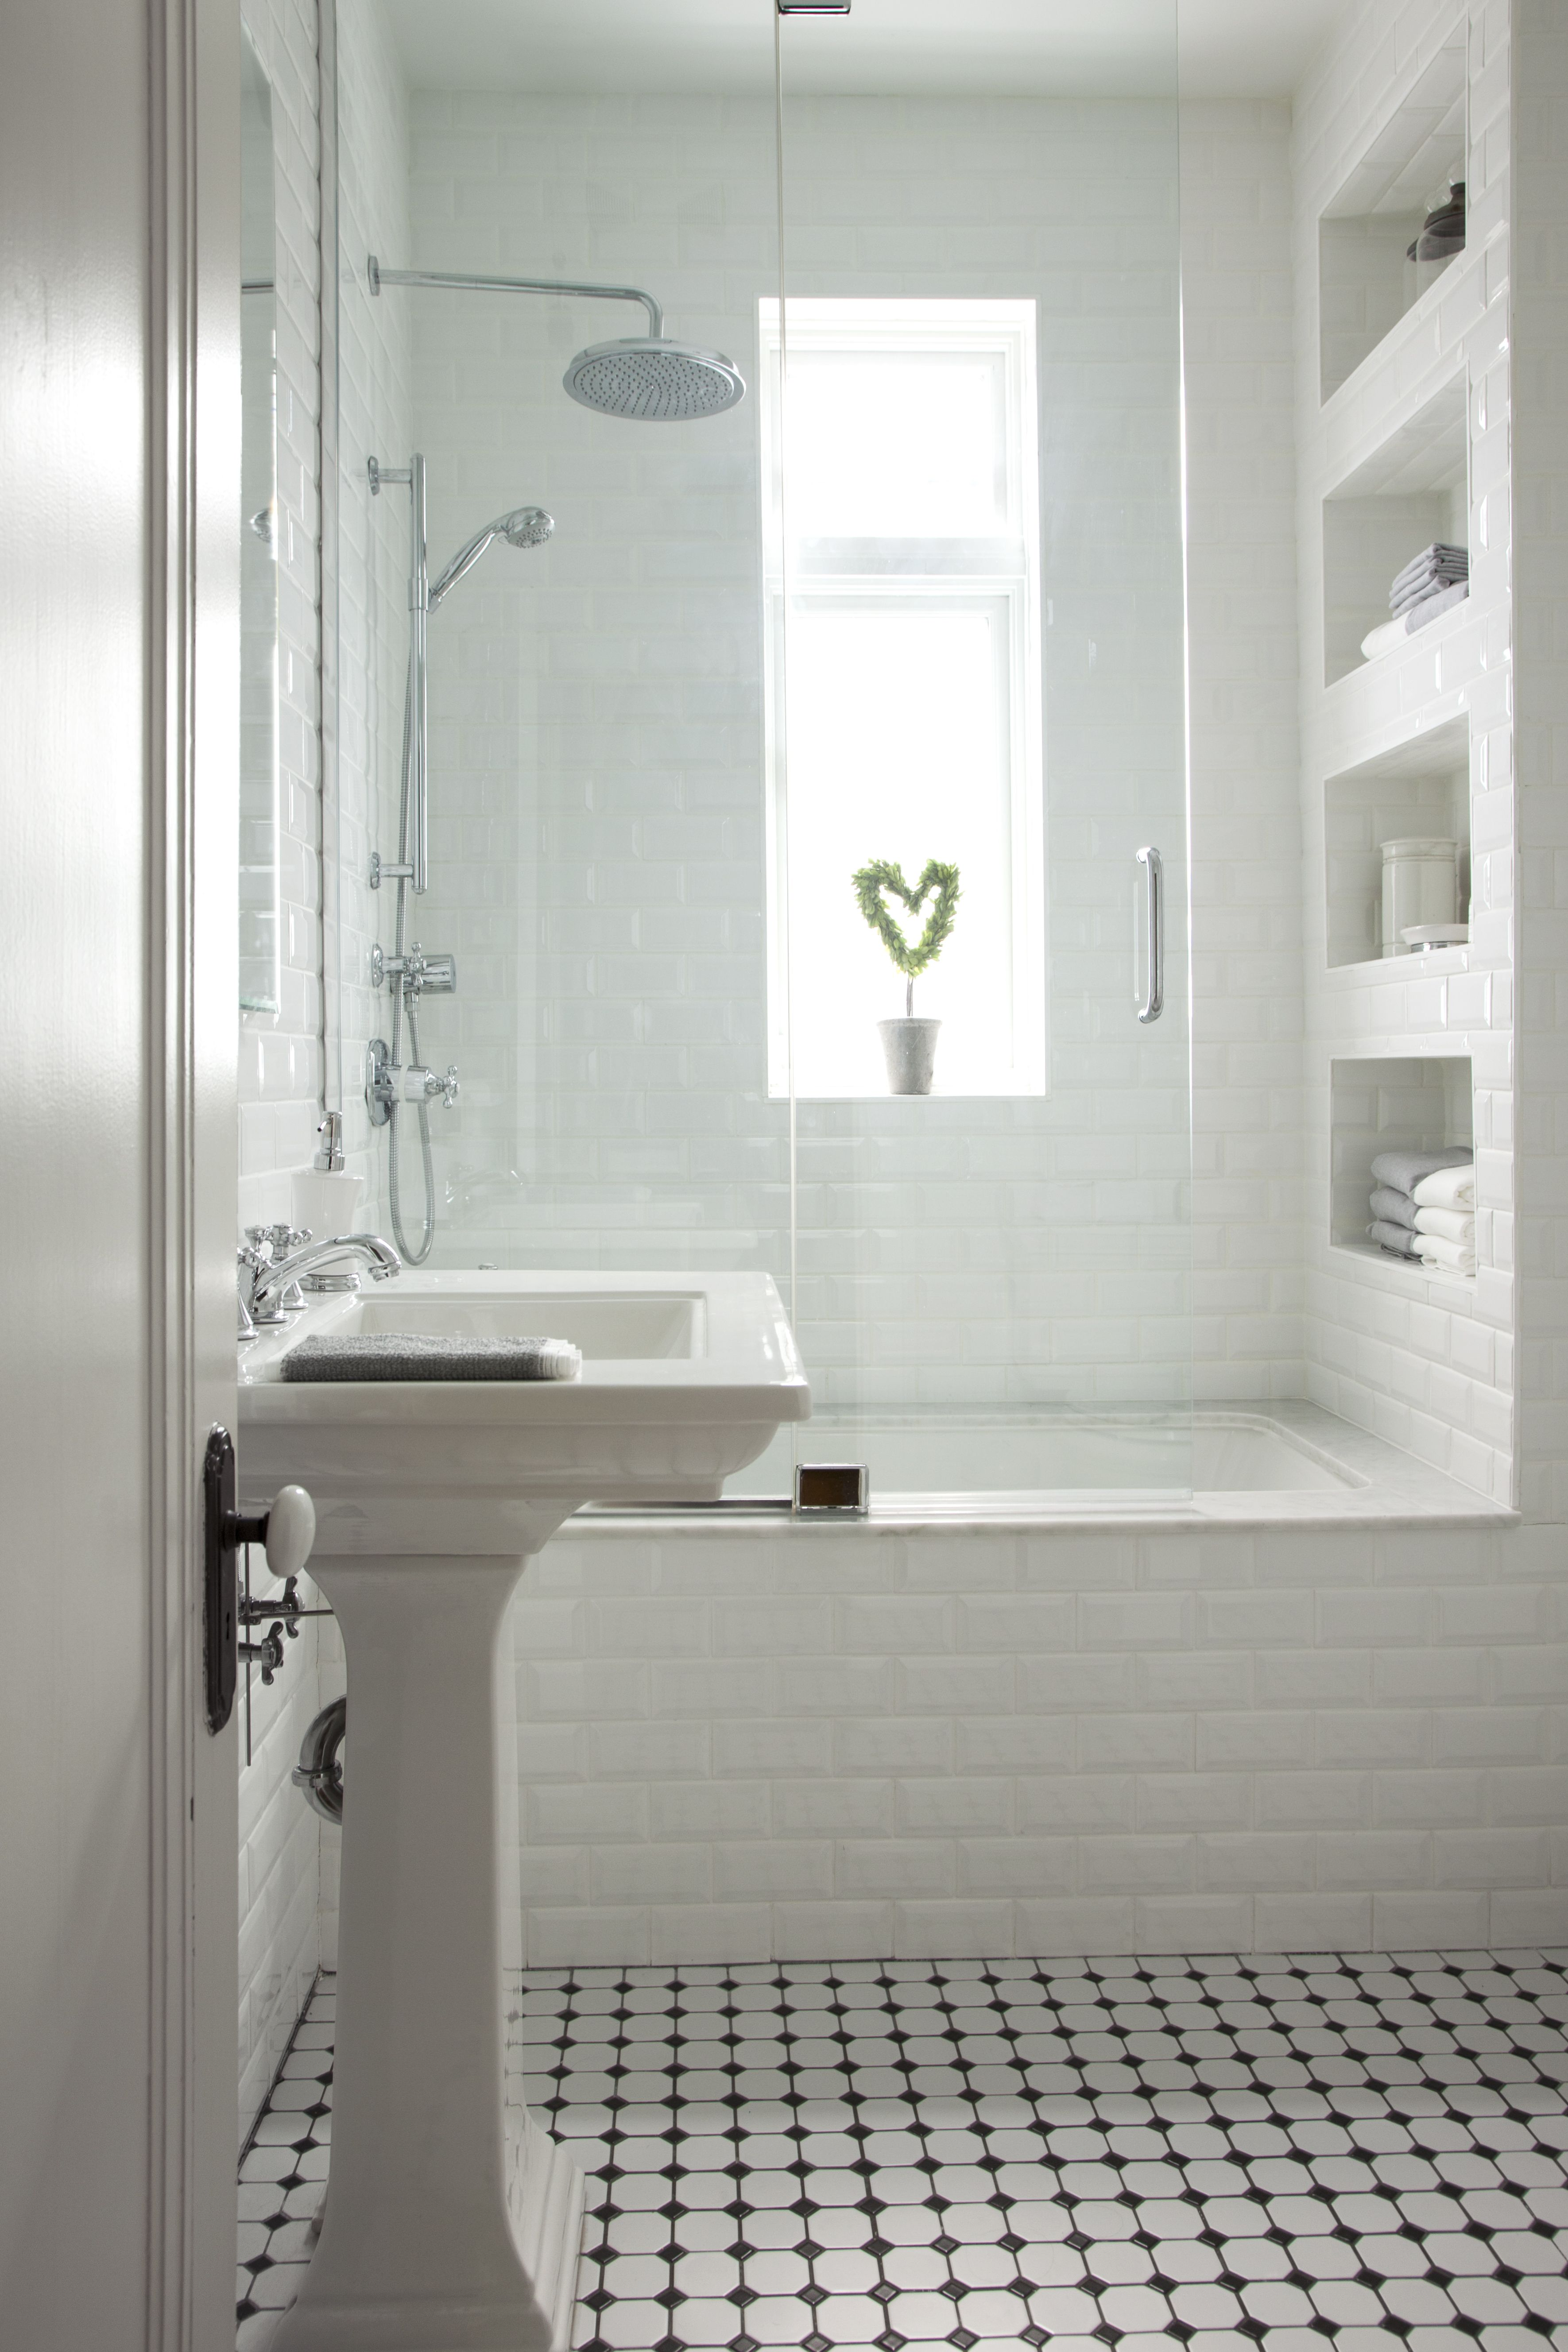 Discover Ideas About Bathroom Interior Design